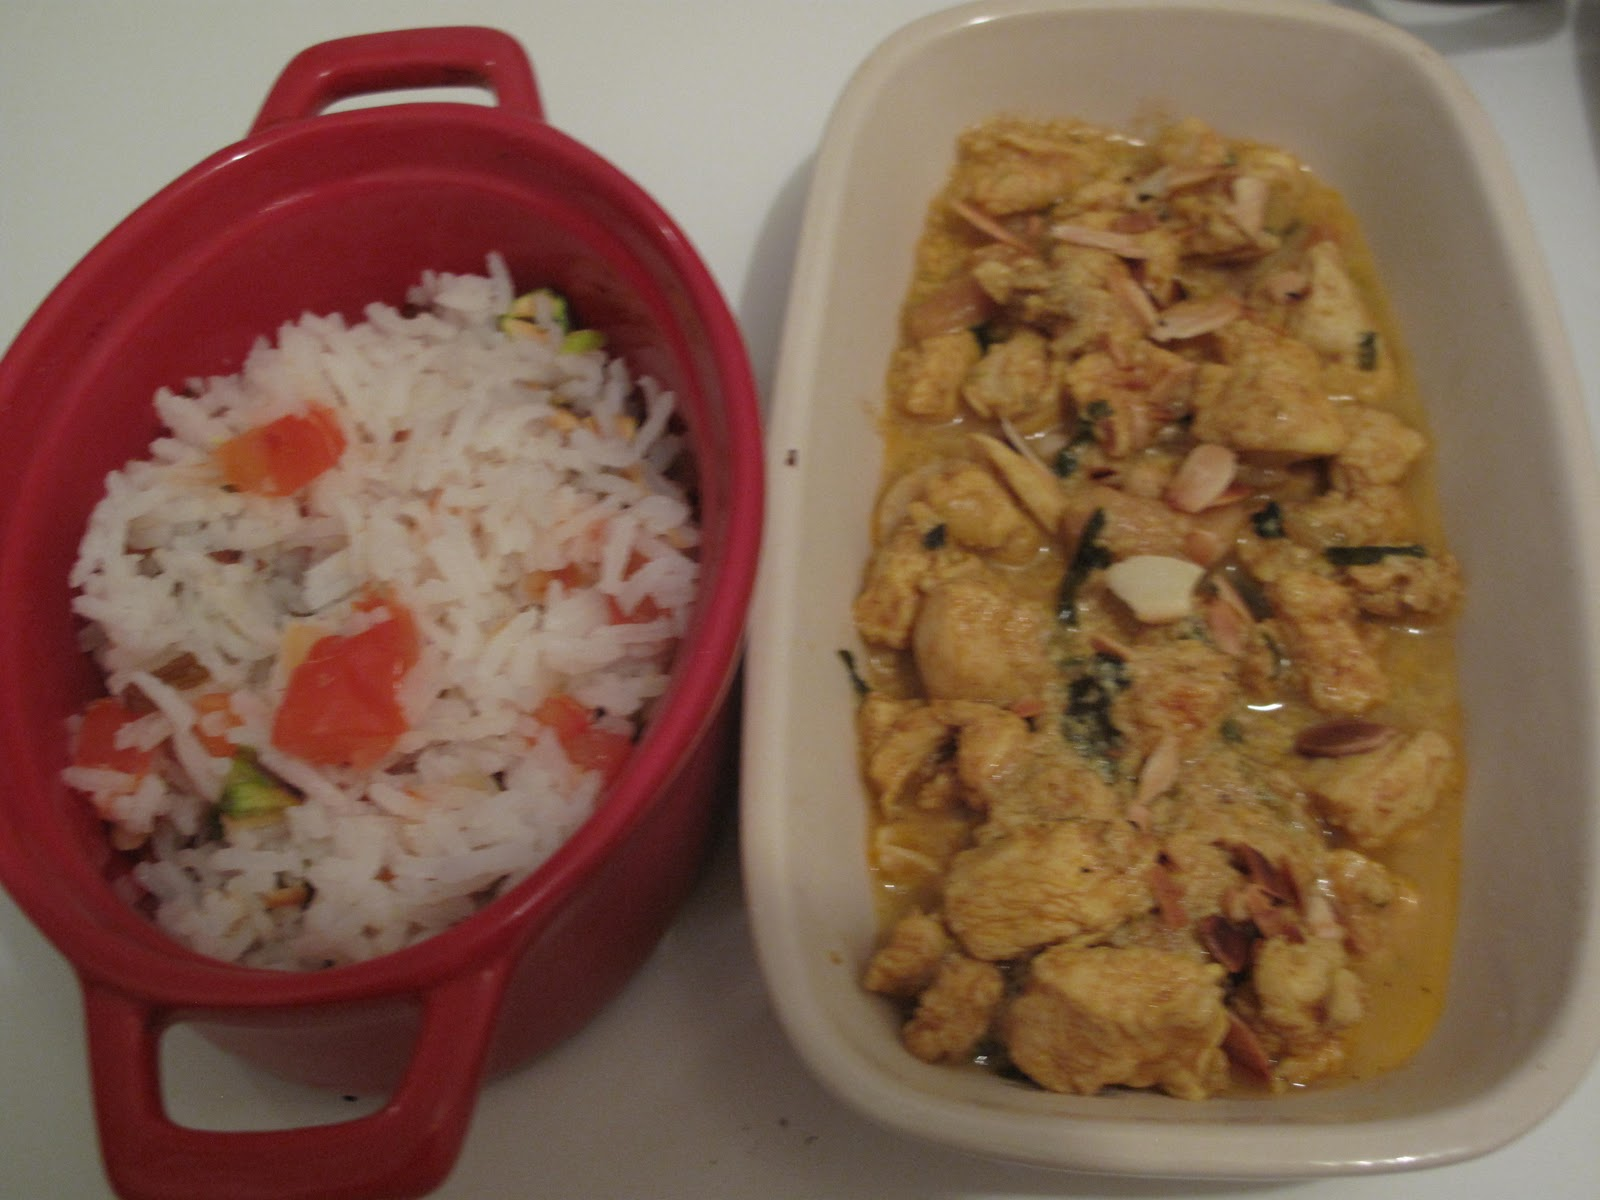 gourmandises homecooked plat indien traditionnel poulet korma et riz pulao. Black Bedroom Furniture Sets. Home Design Ideas